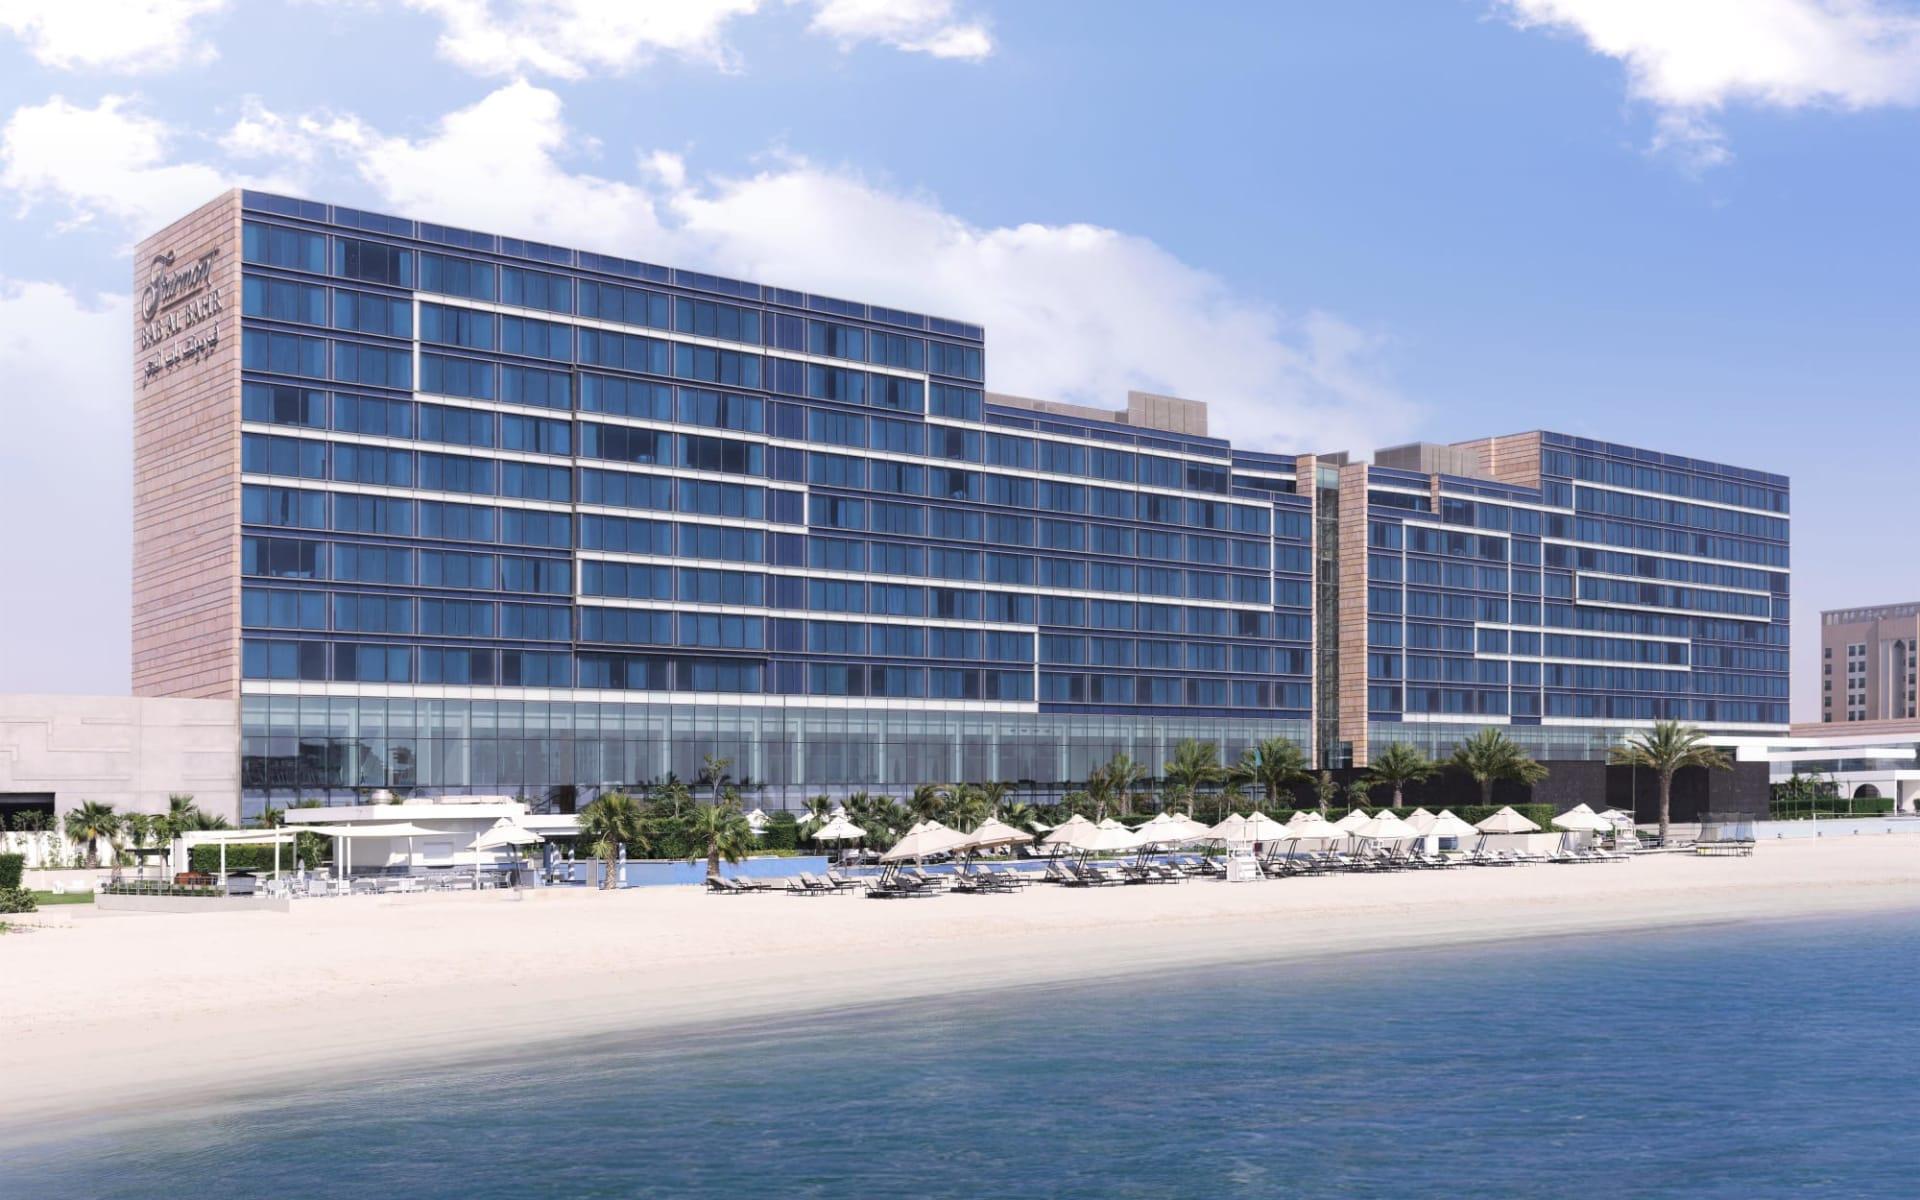 Fairmont Bab al Bahr in Abu Dhabi: